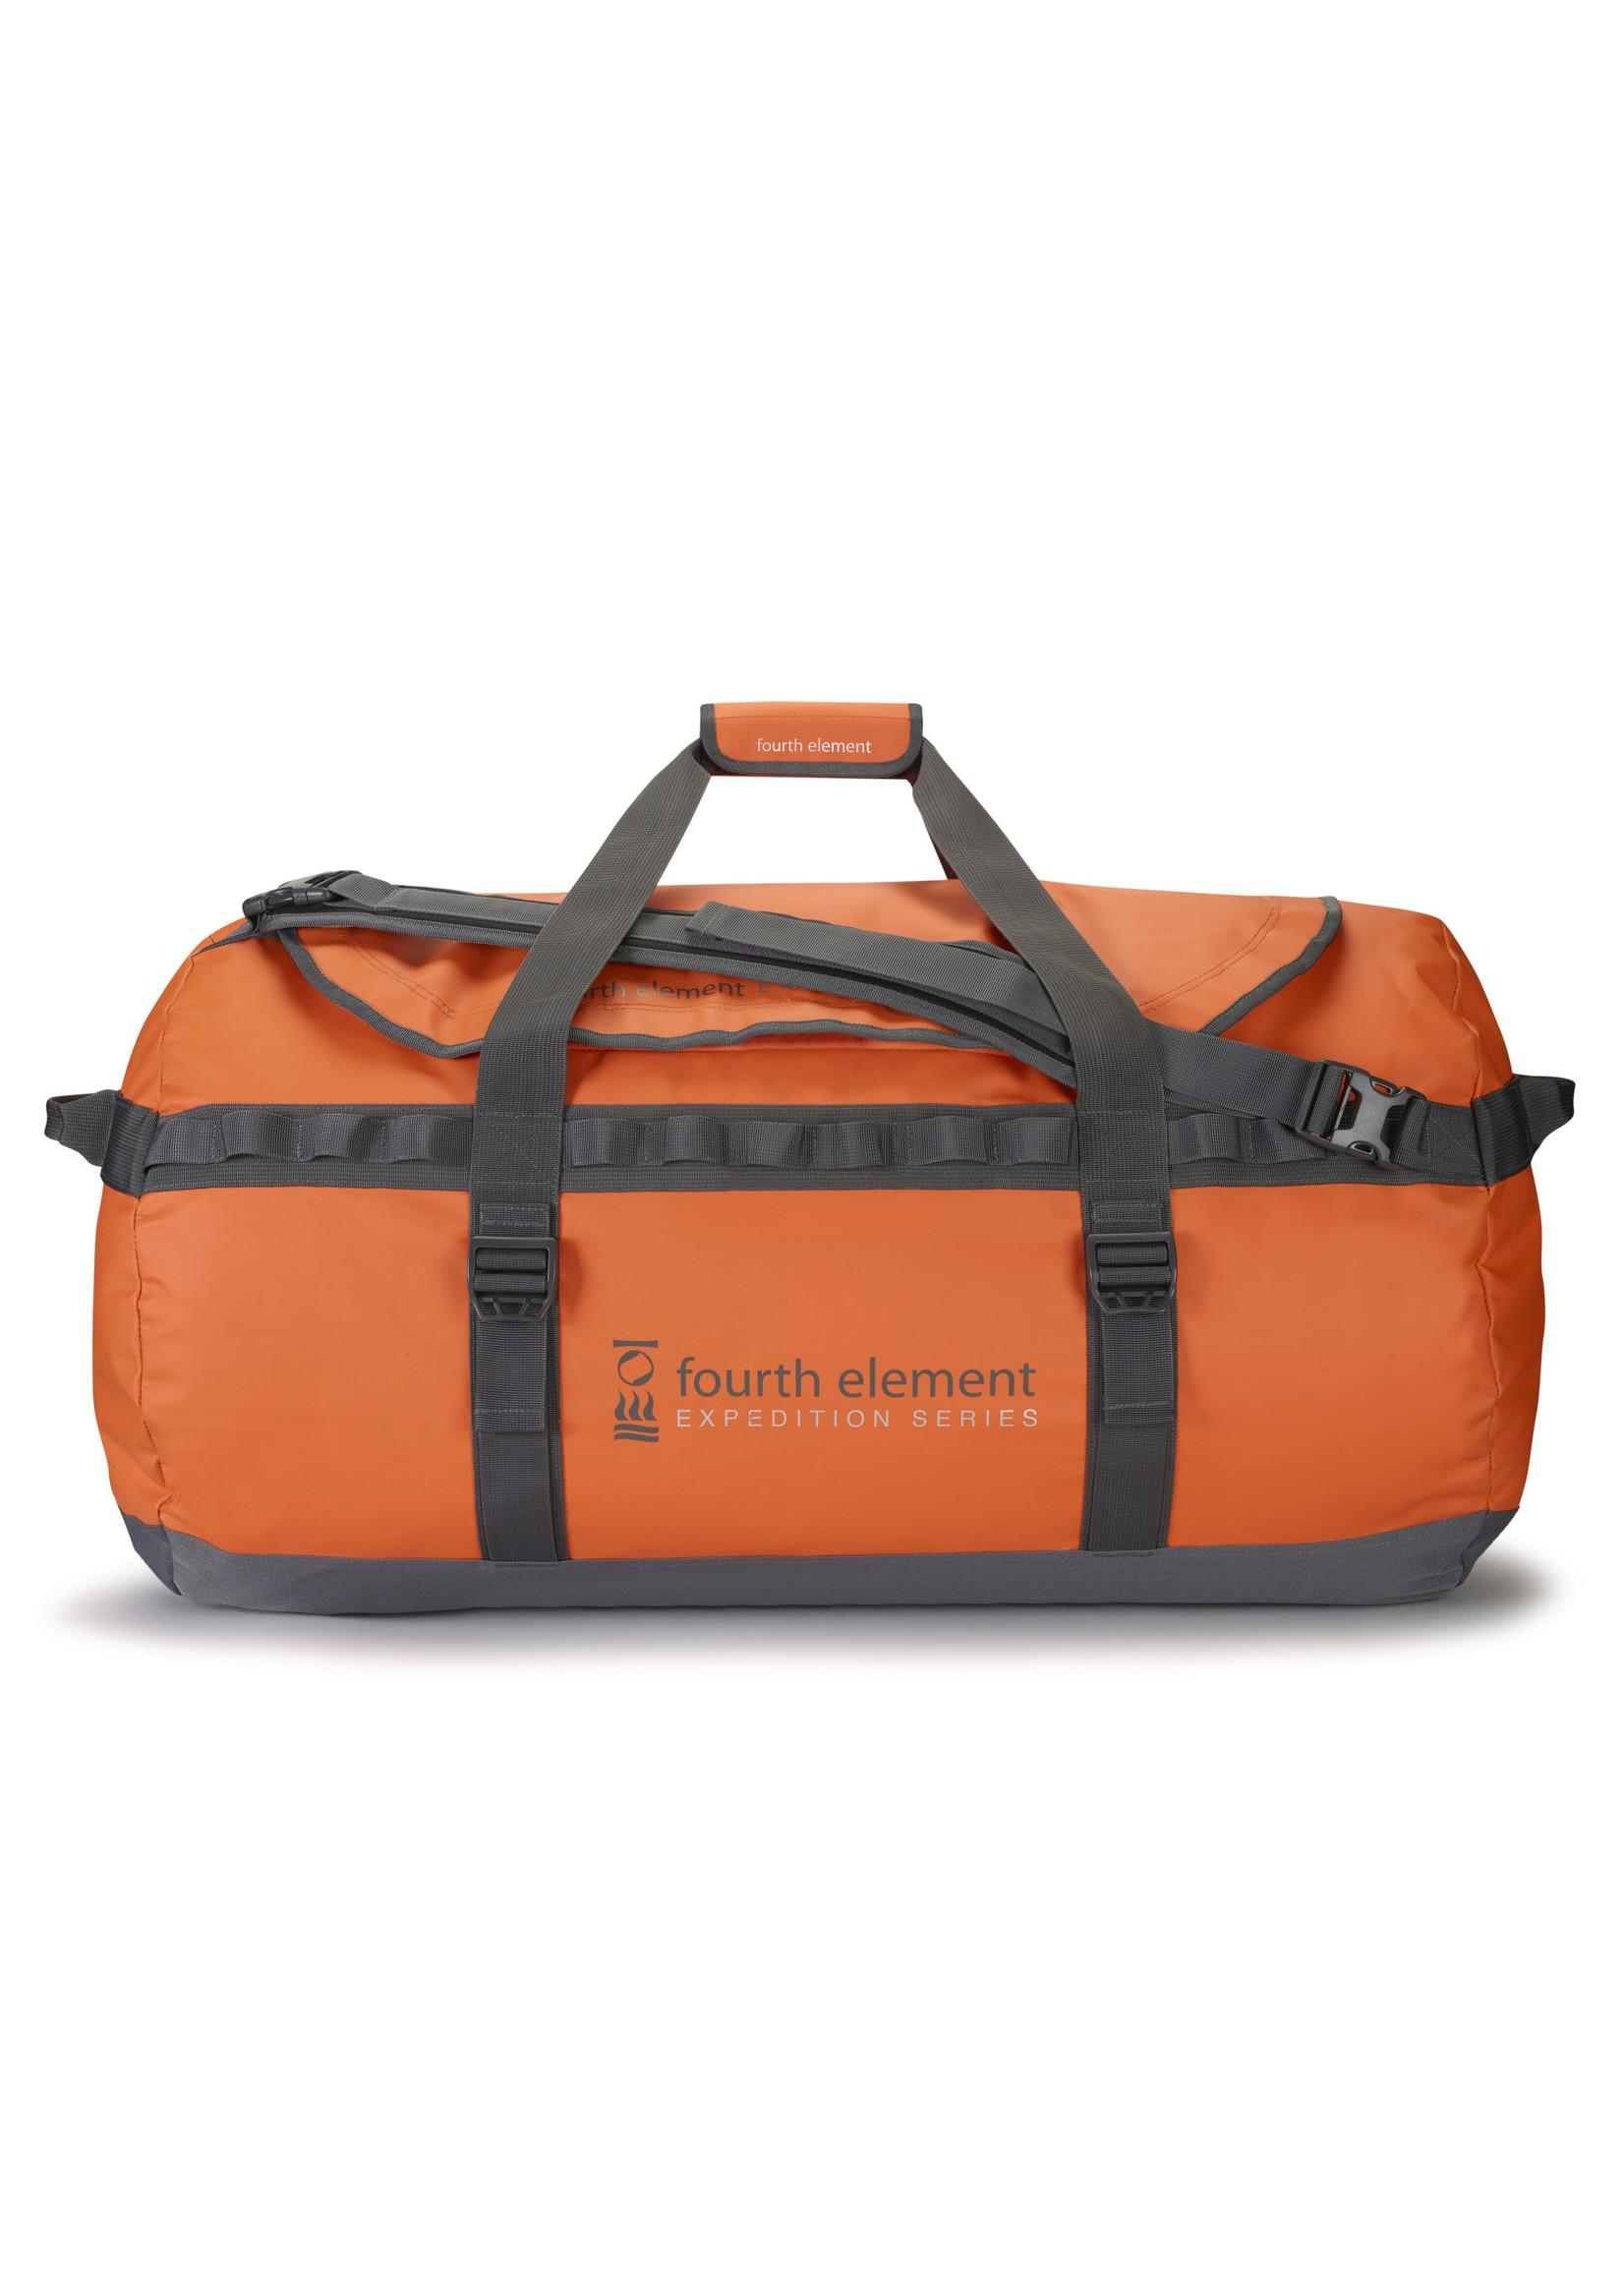 Fourth Element Fourth Element Expedition Series Duffel Bag 120L - Orange